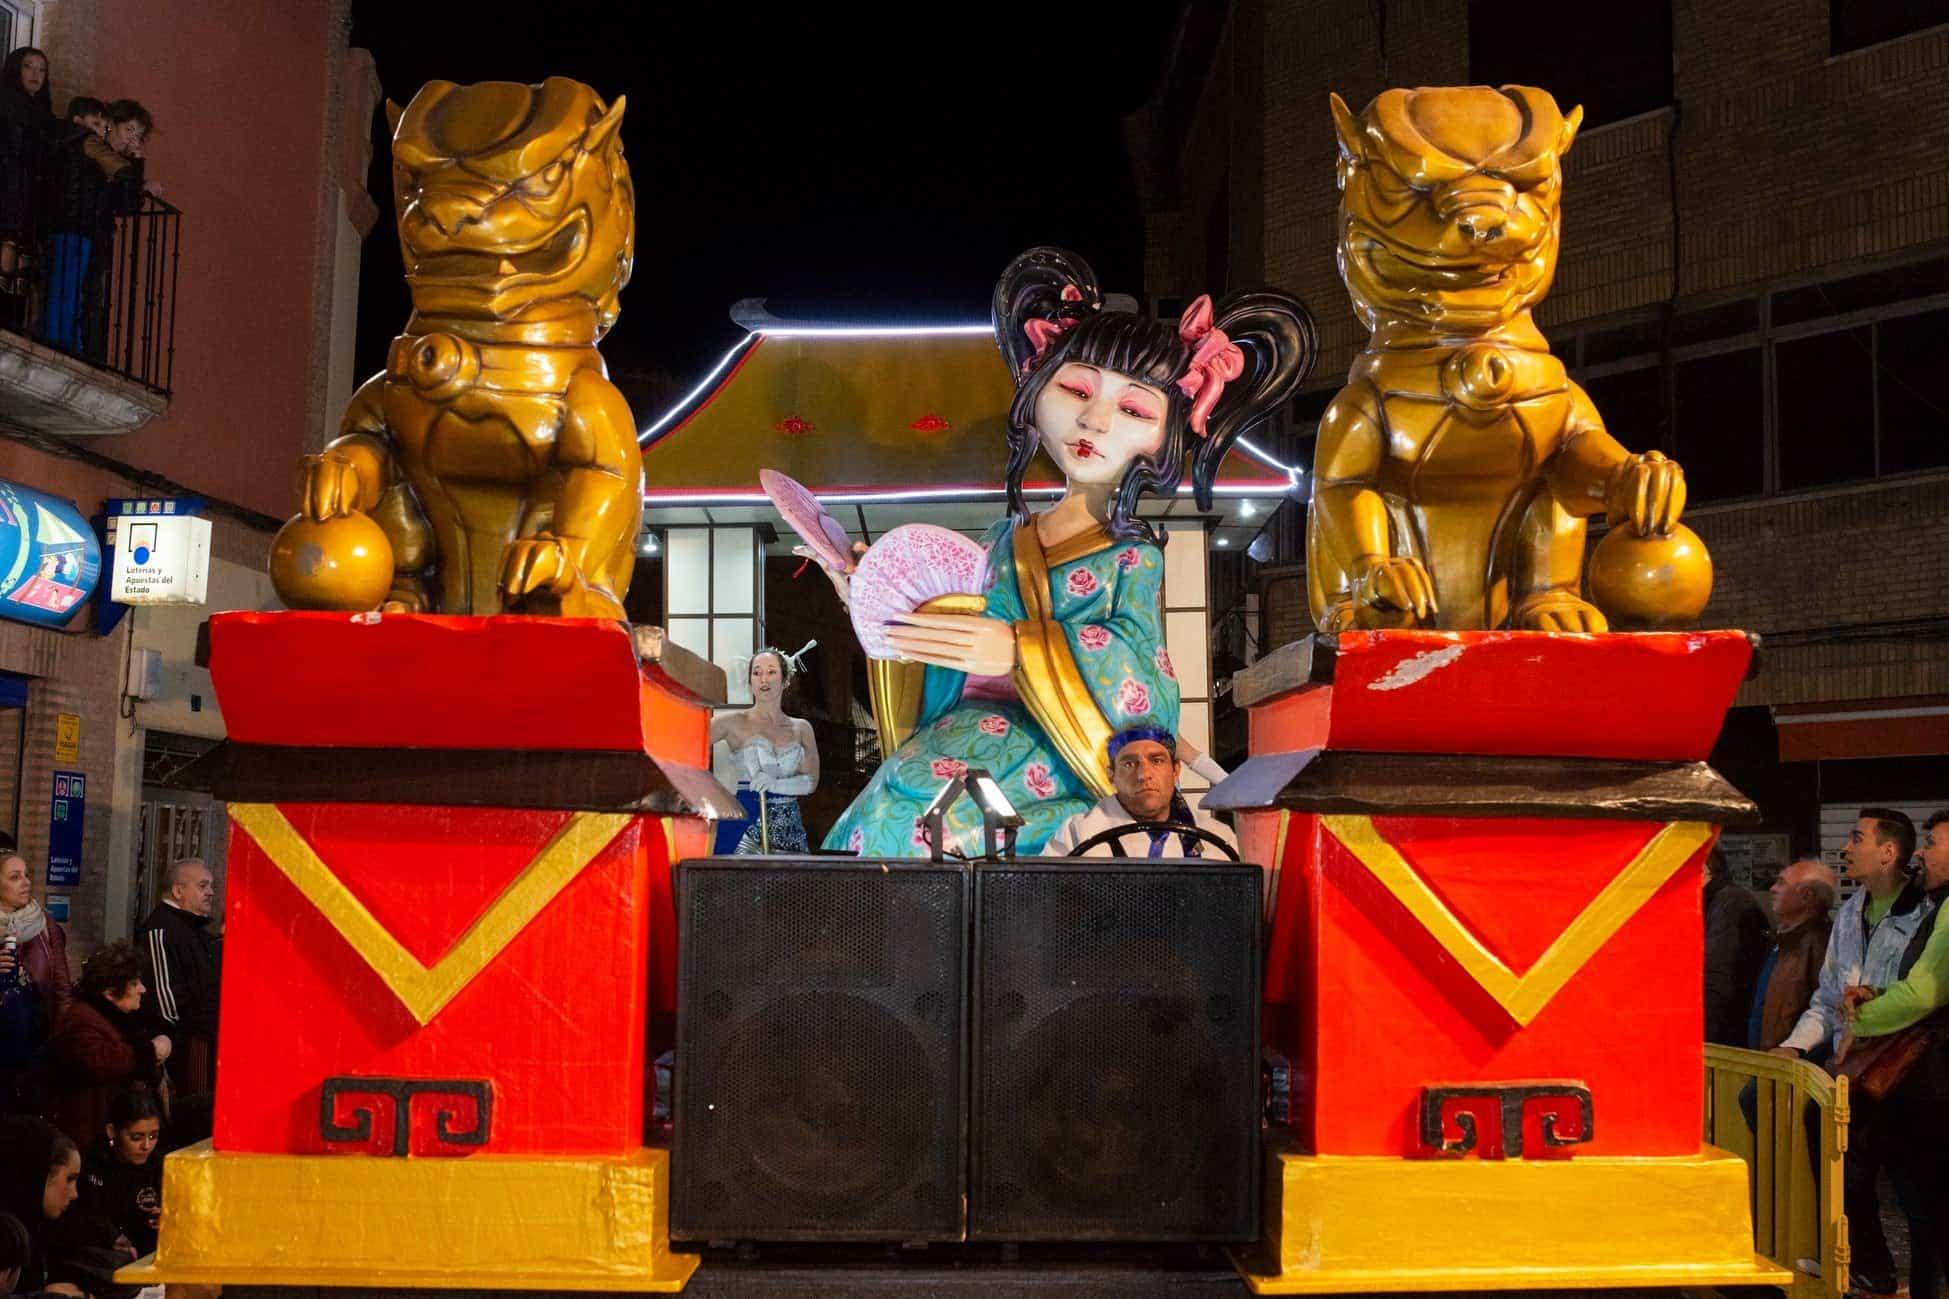 Carnaval de herencia 2020 ofertorio 34 - Selección de fotografías del Ofertorio del Carnaval de Herencia